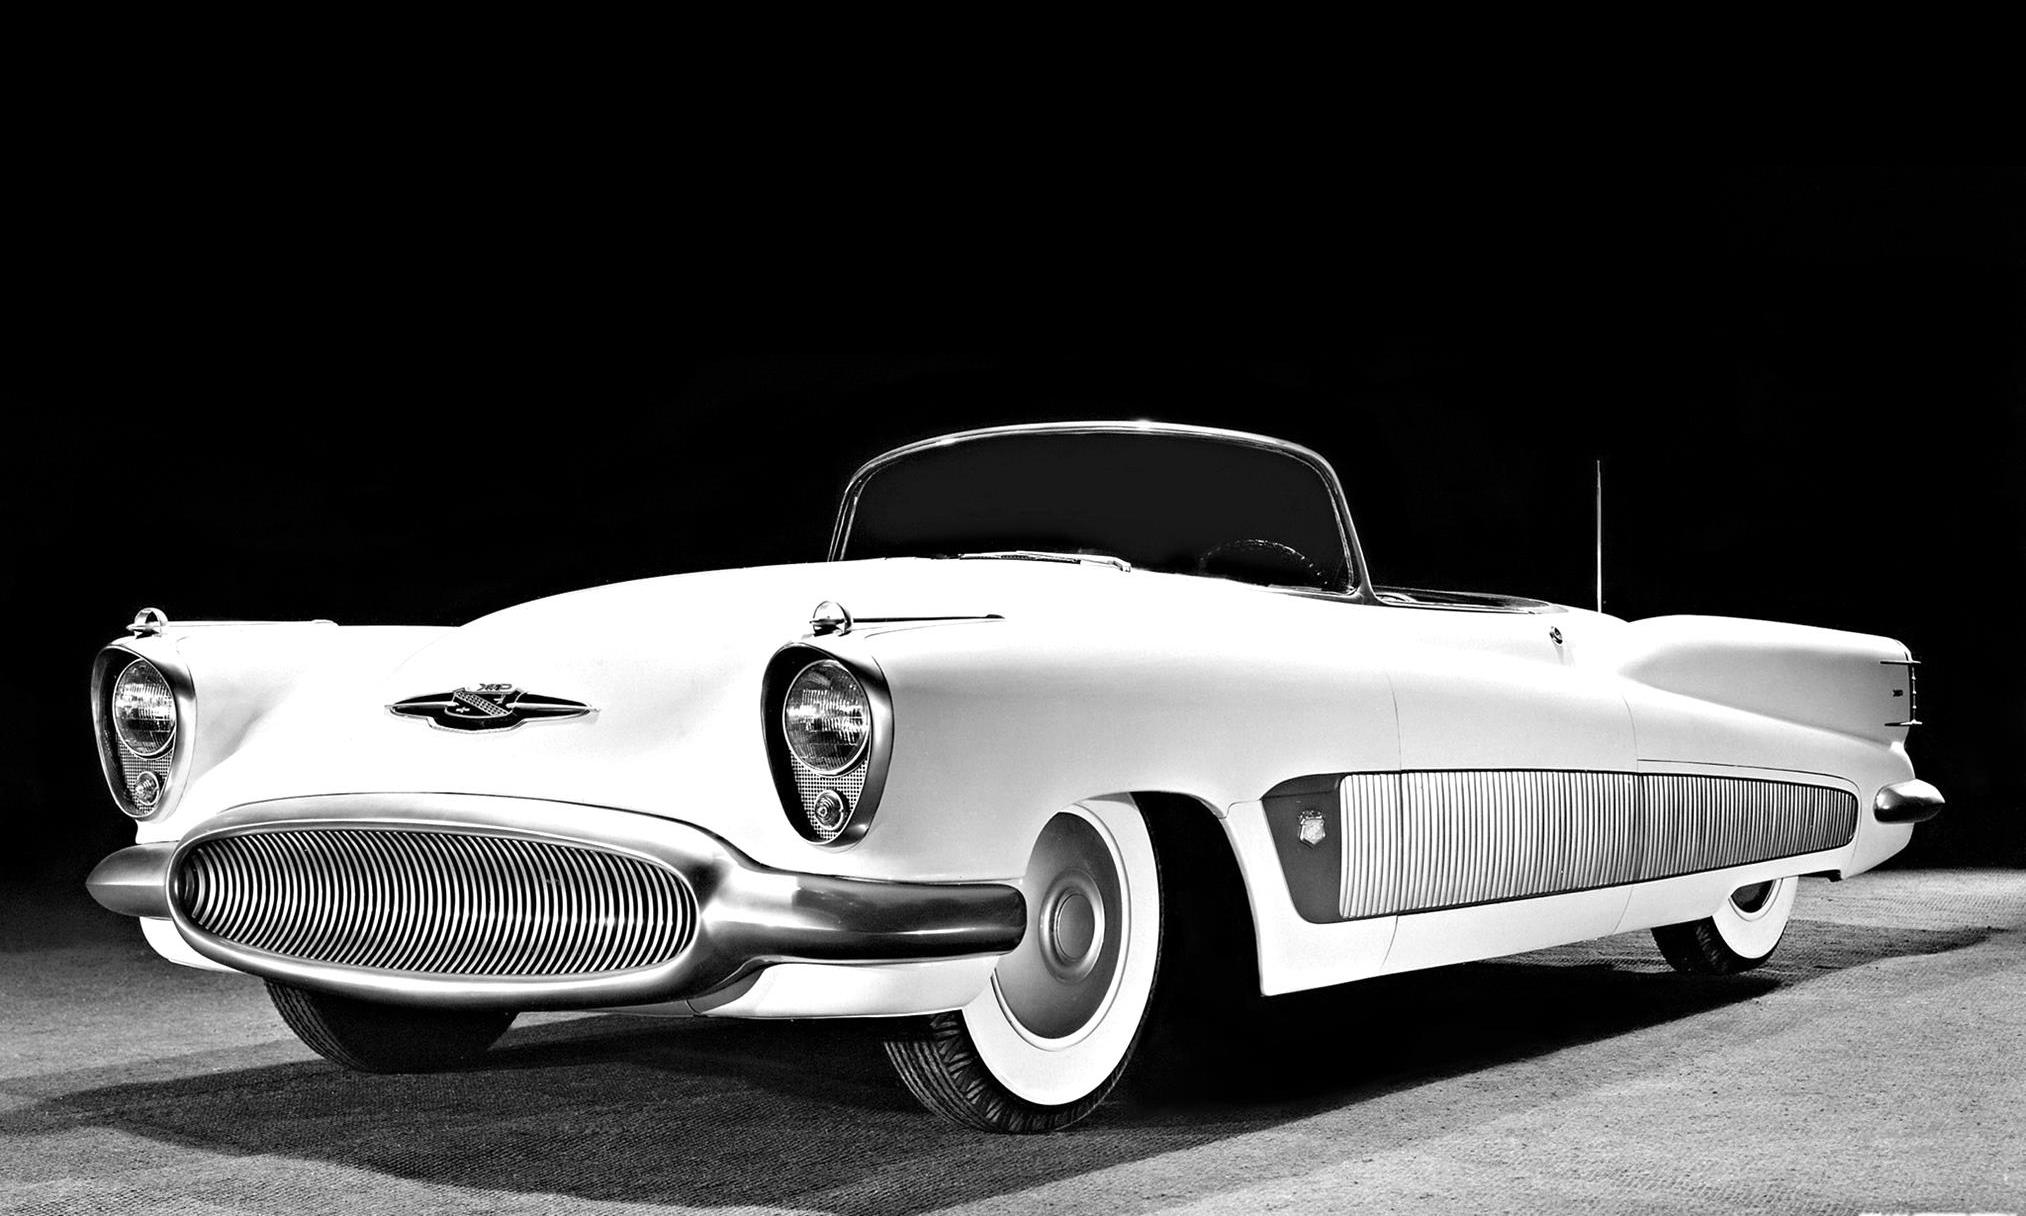 The-Best-Vintage-Car-Wallpapers-14-Best-Vintage-Car-wv-aston-martin-ferarri.jpg